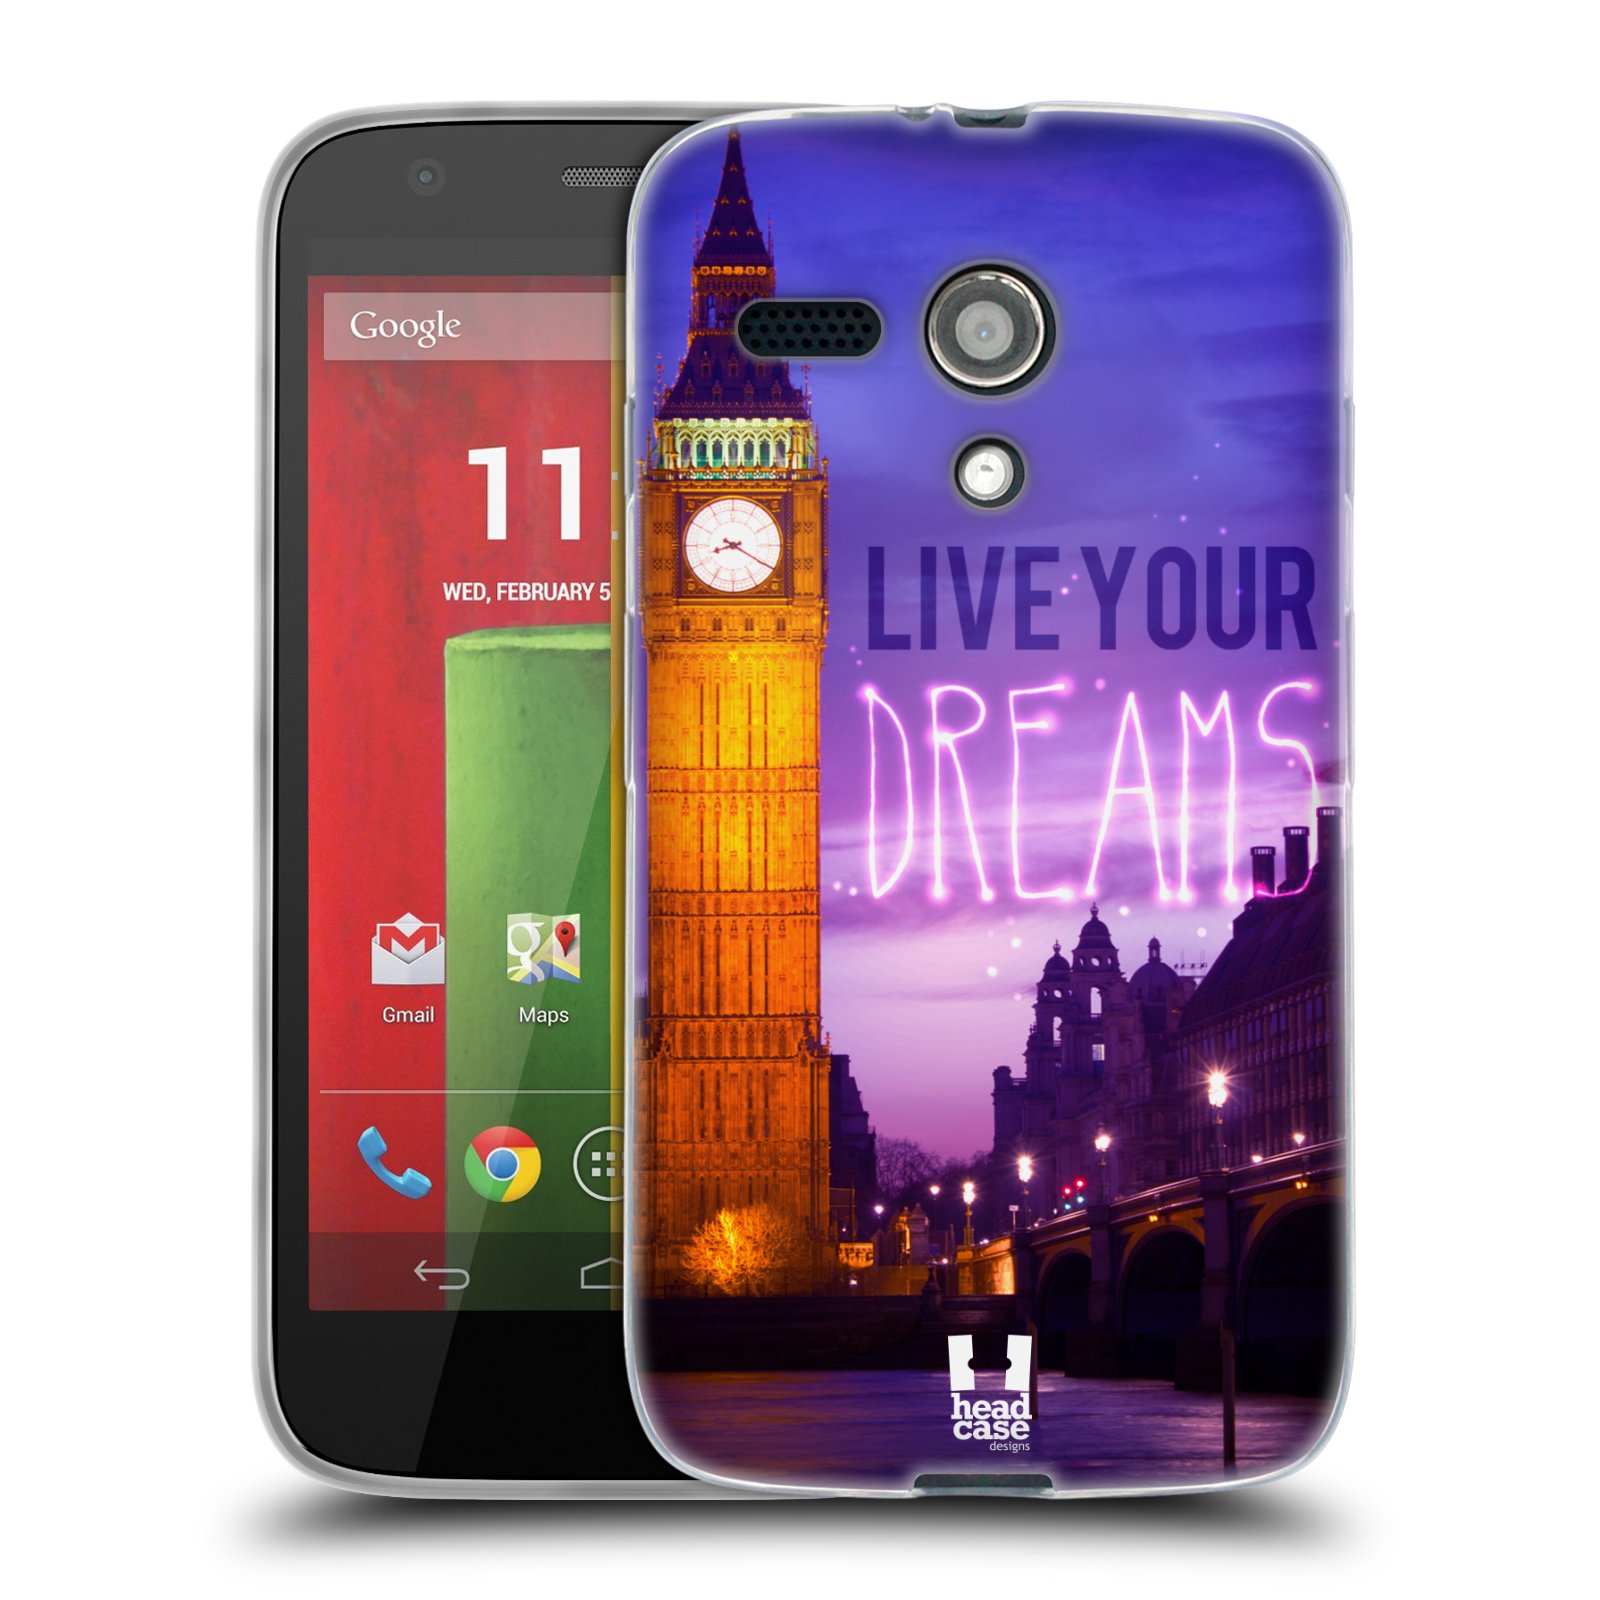 Silikonové pouzdro na mobil Motorola Moto G HEAD CASE DREAMS (Silikonový kryt či obal na mobilní telefon Motorola Moto G)